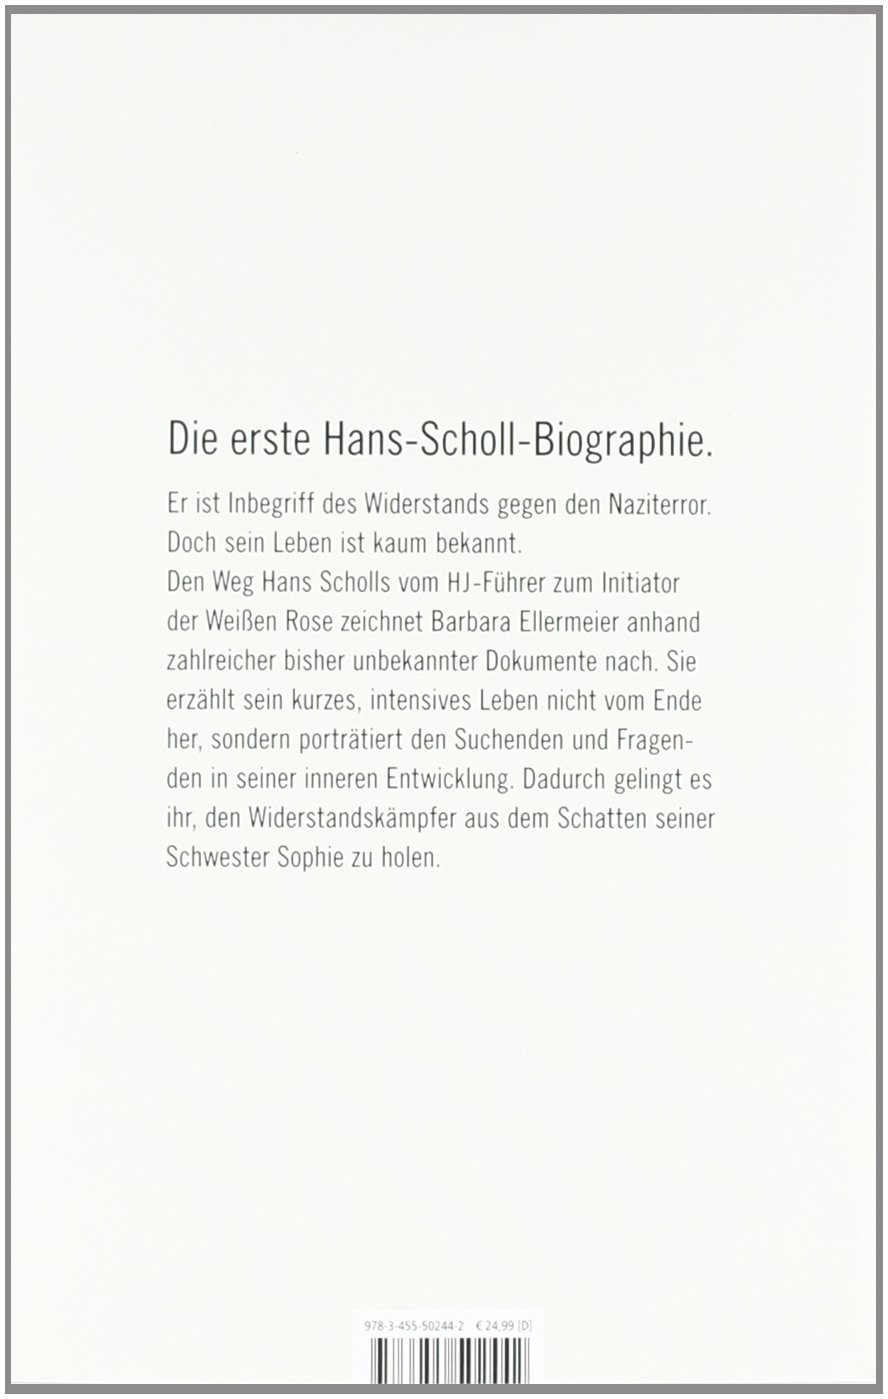 Hans Scholl: 9783455502442: Amazon.com: Books